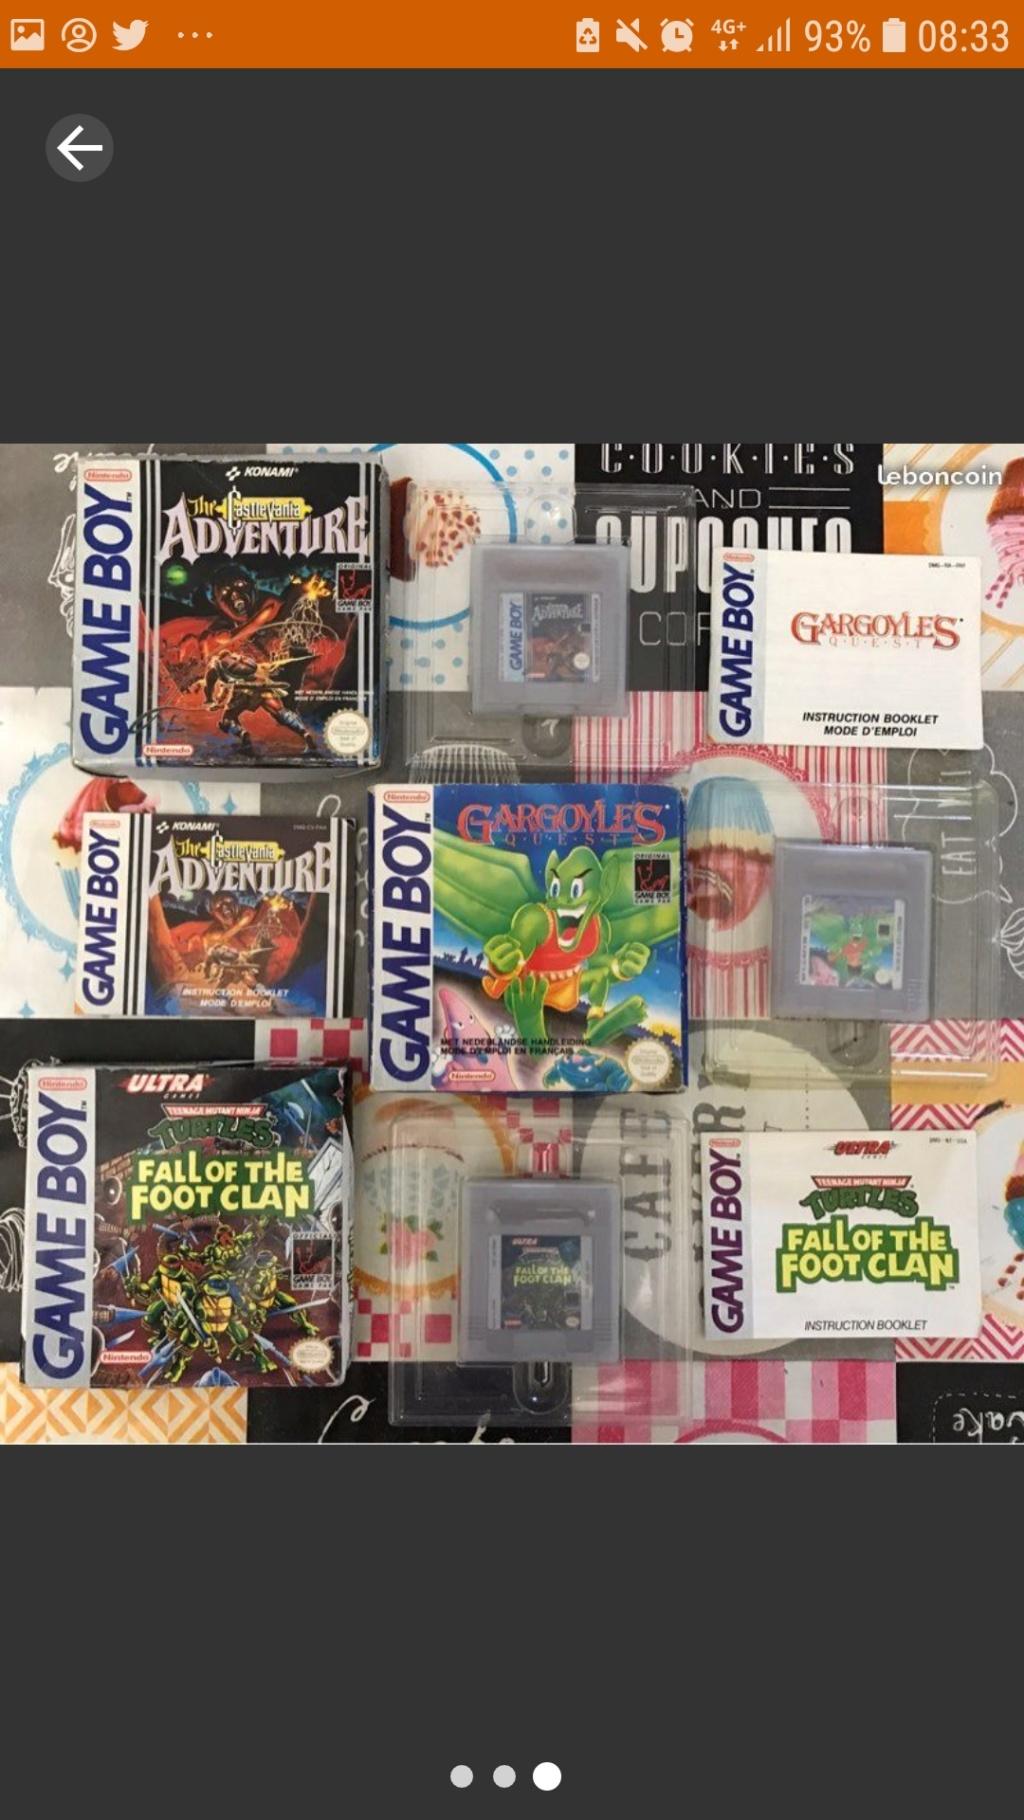 [ESTIM] Jeux Gameboy en boite Castlevania Gargoyle quest et Tortue Ninja Screen29